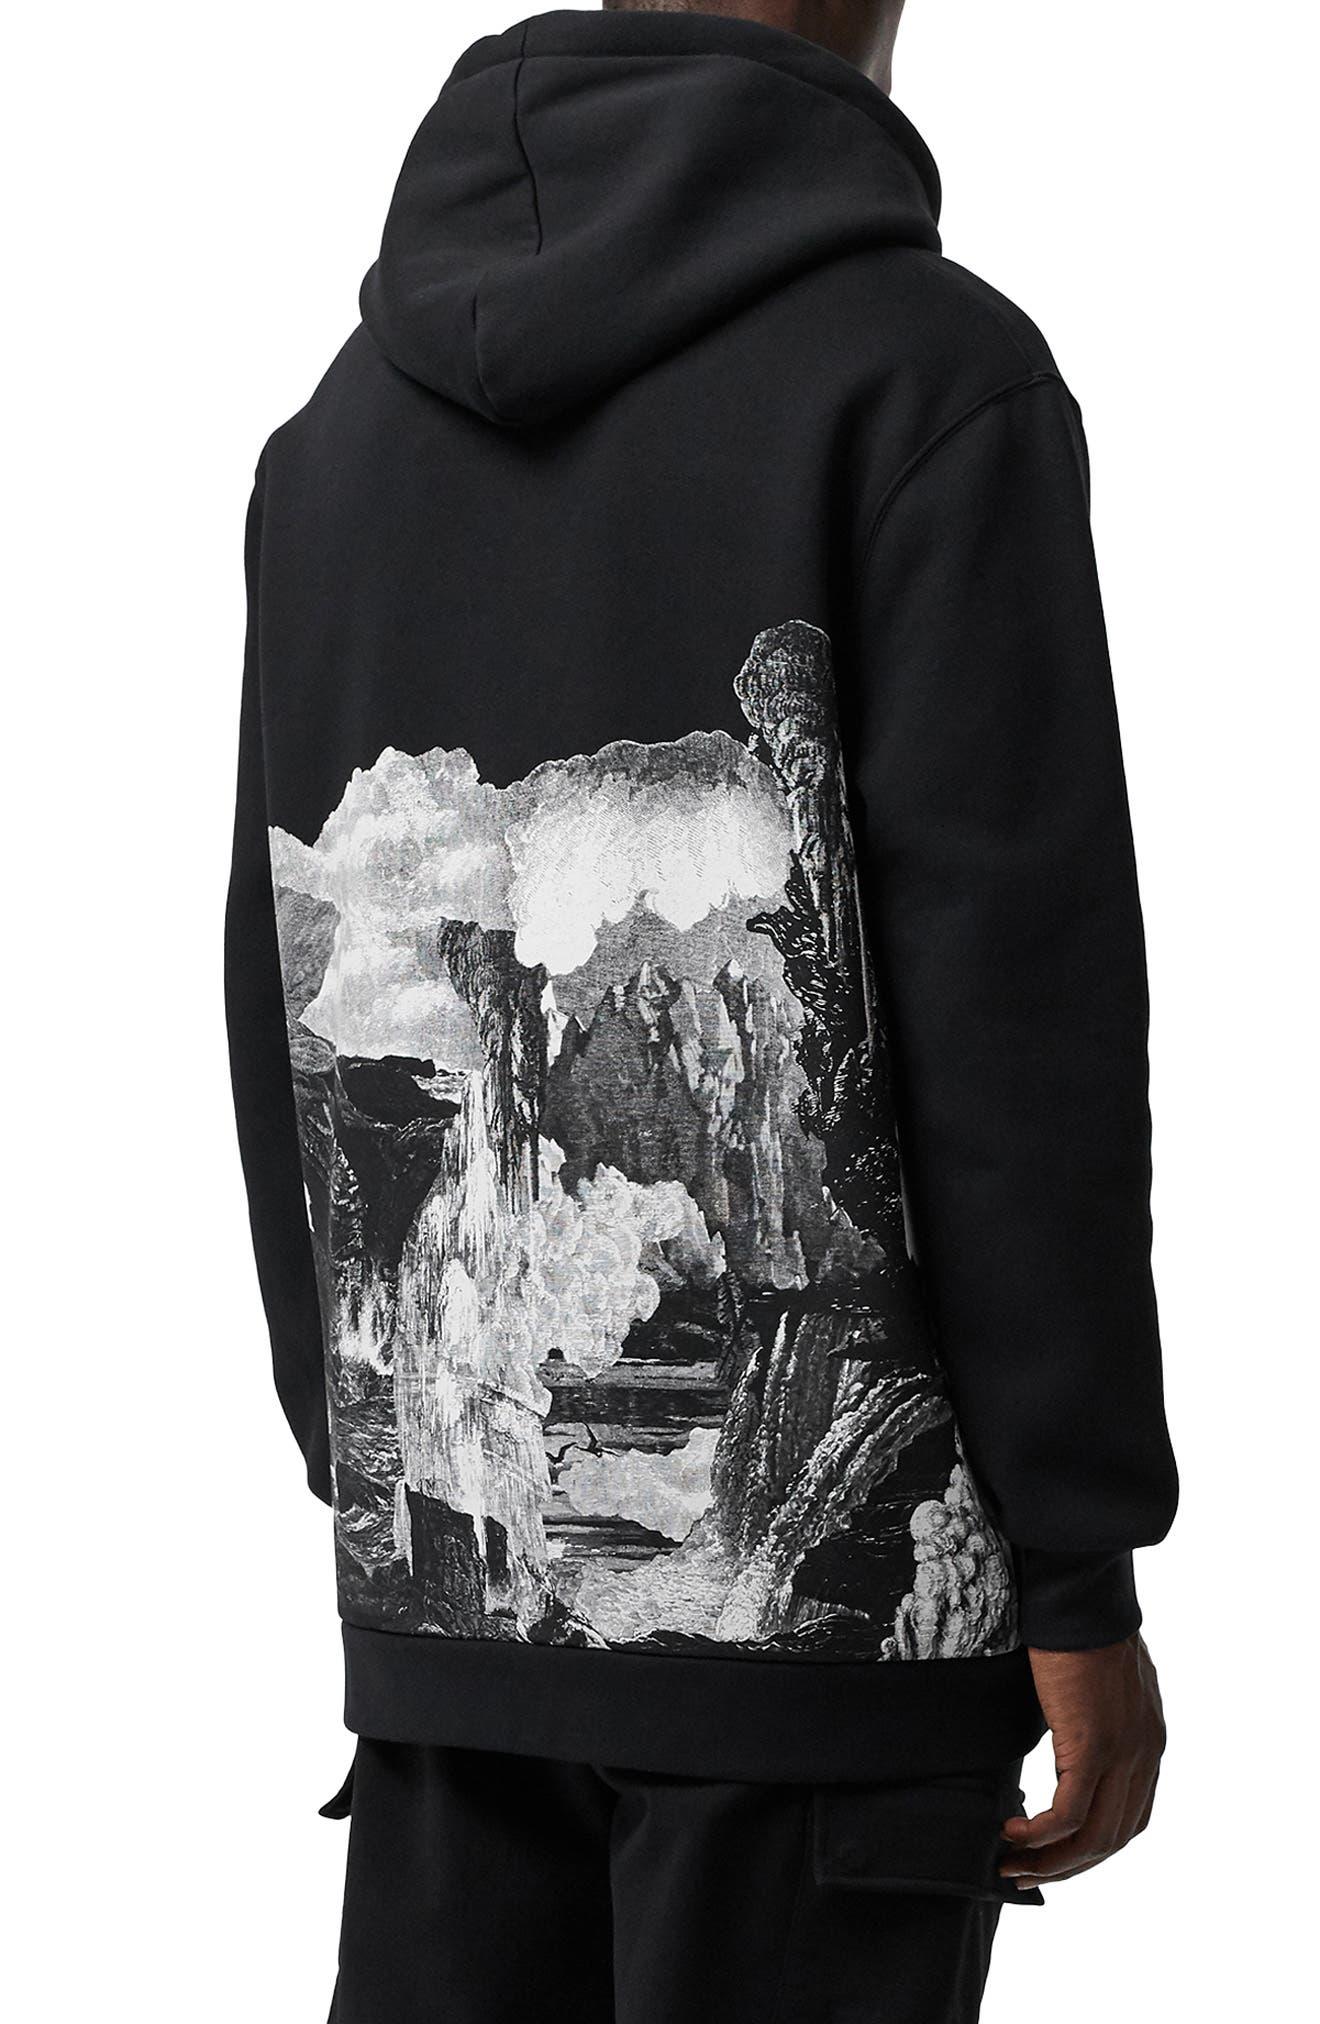 BURBERRY, Dreamscape Print Hooded Sweatshirt, Main thumbnail 1, color, BLACK